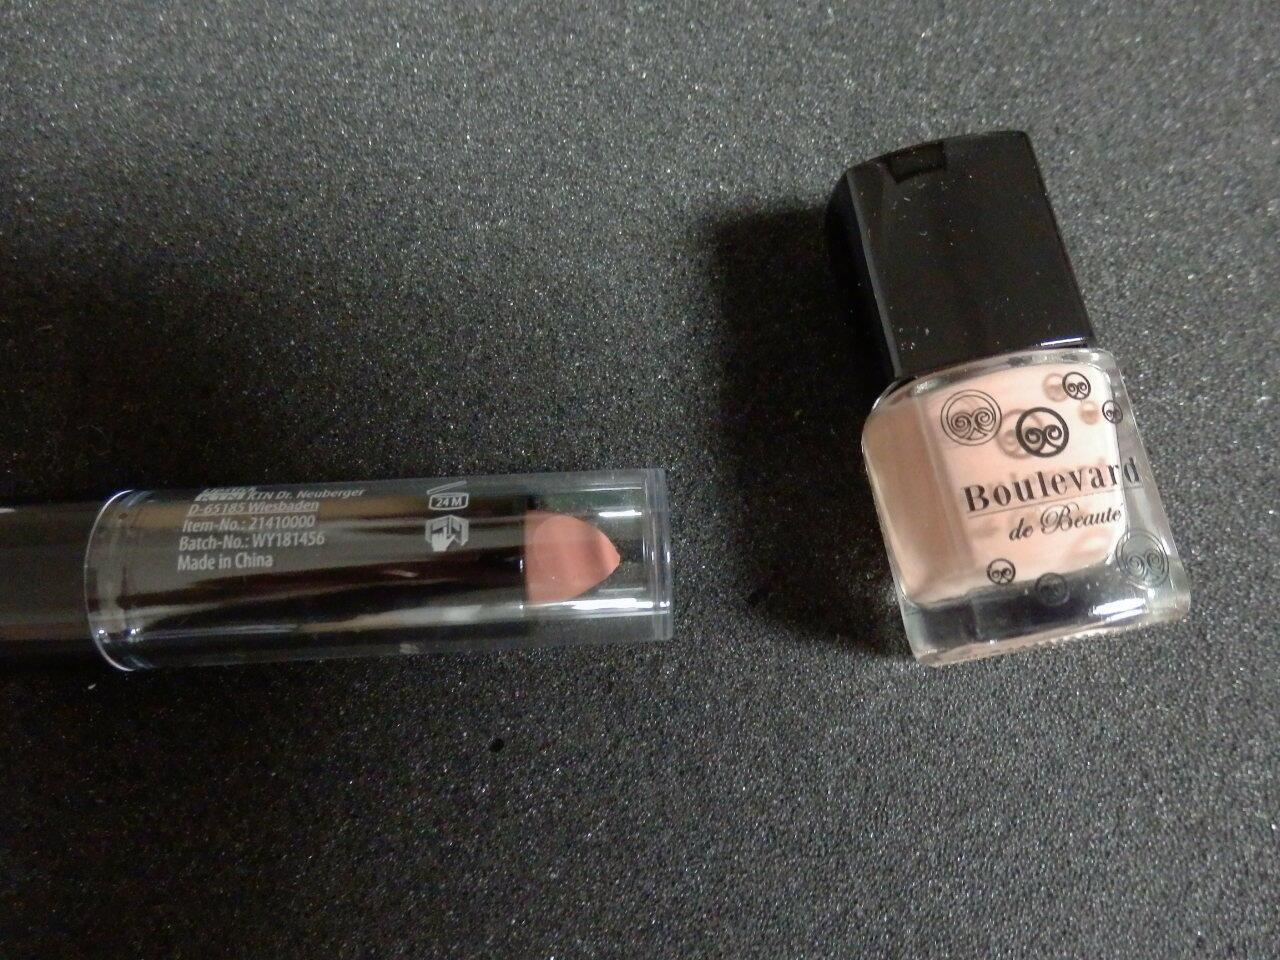 BOULEVARD de BEAUTE: Nagellack und Lippenstift in tauperose - original